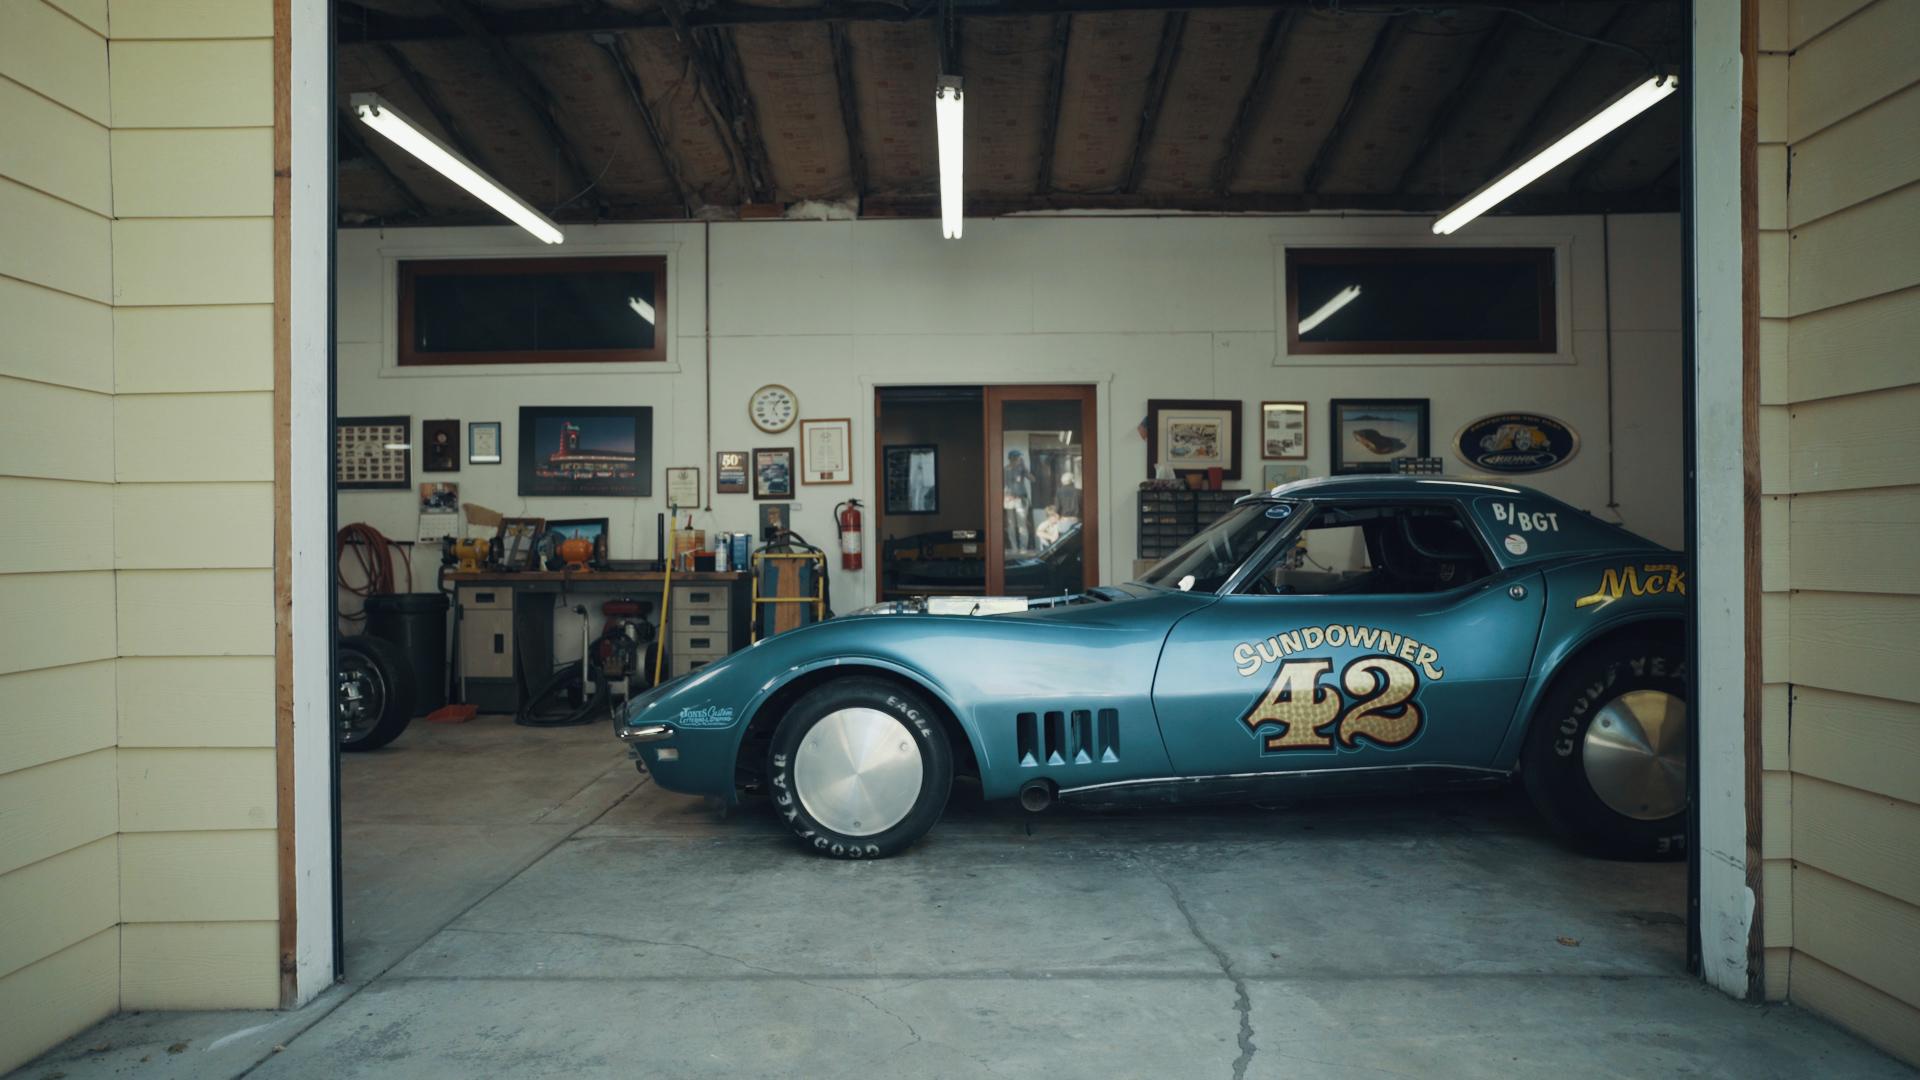 Bonneville_The_Worlds_Fastest_Doc_Film_Moto-Mucci (2).jpg